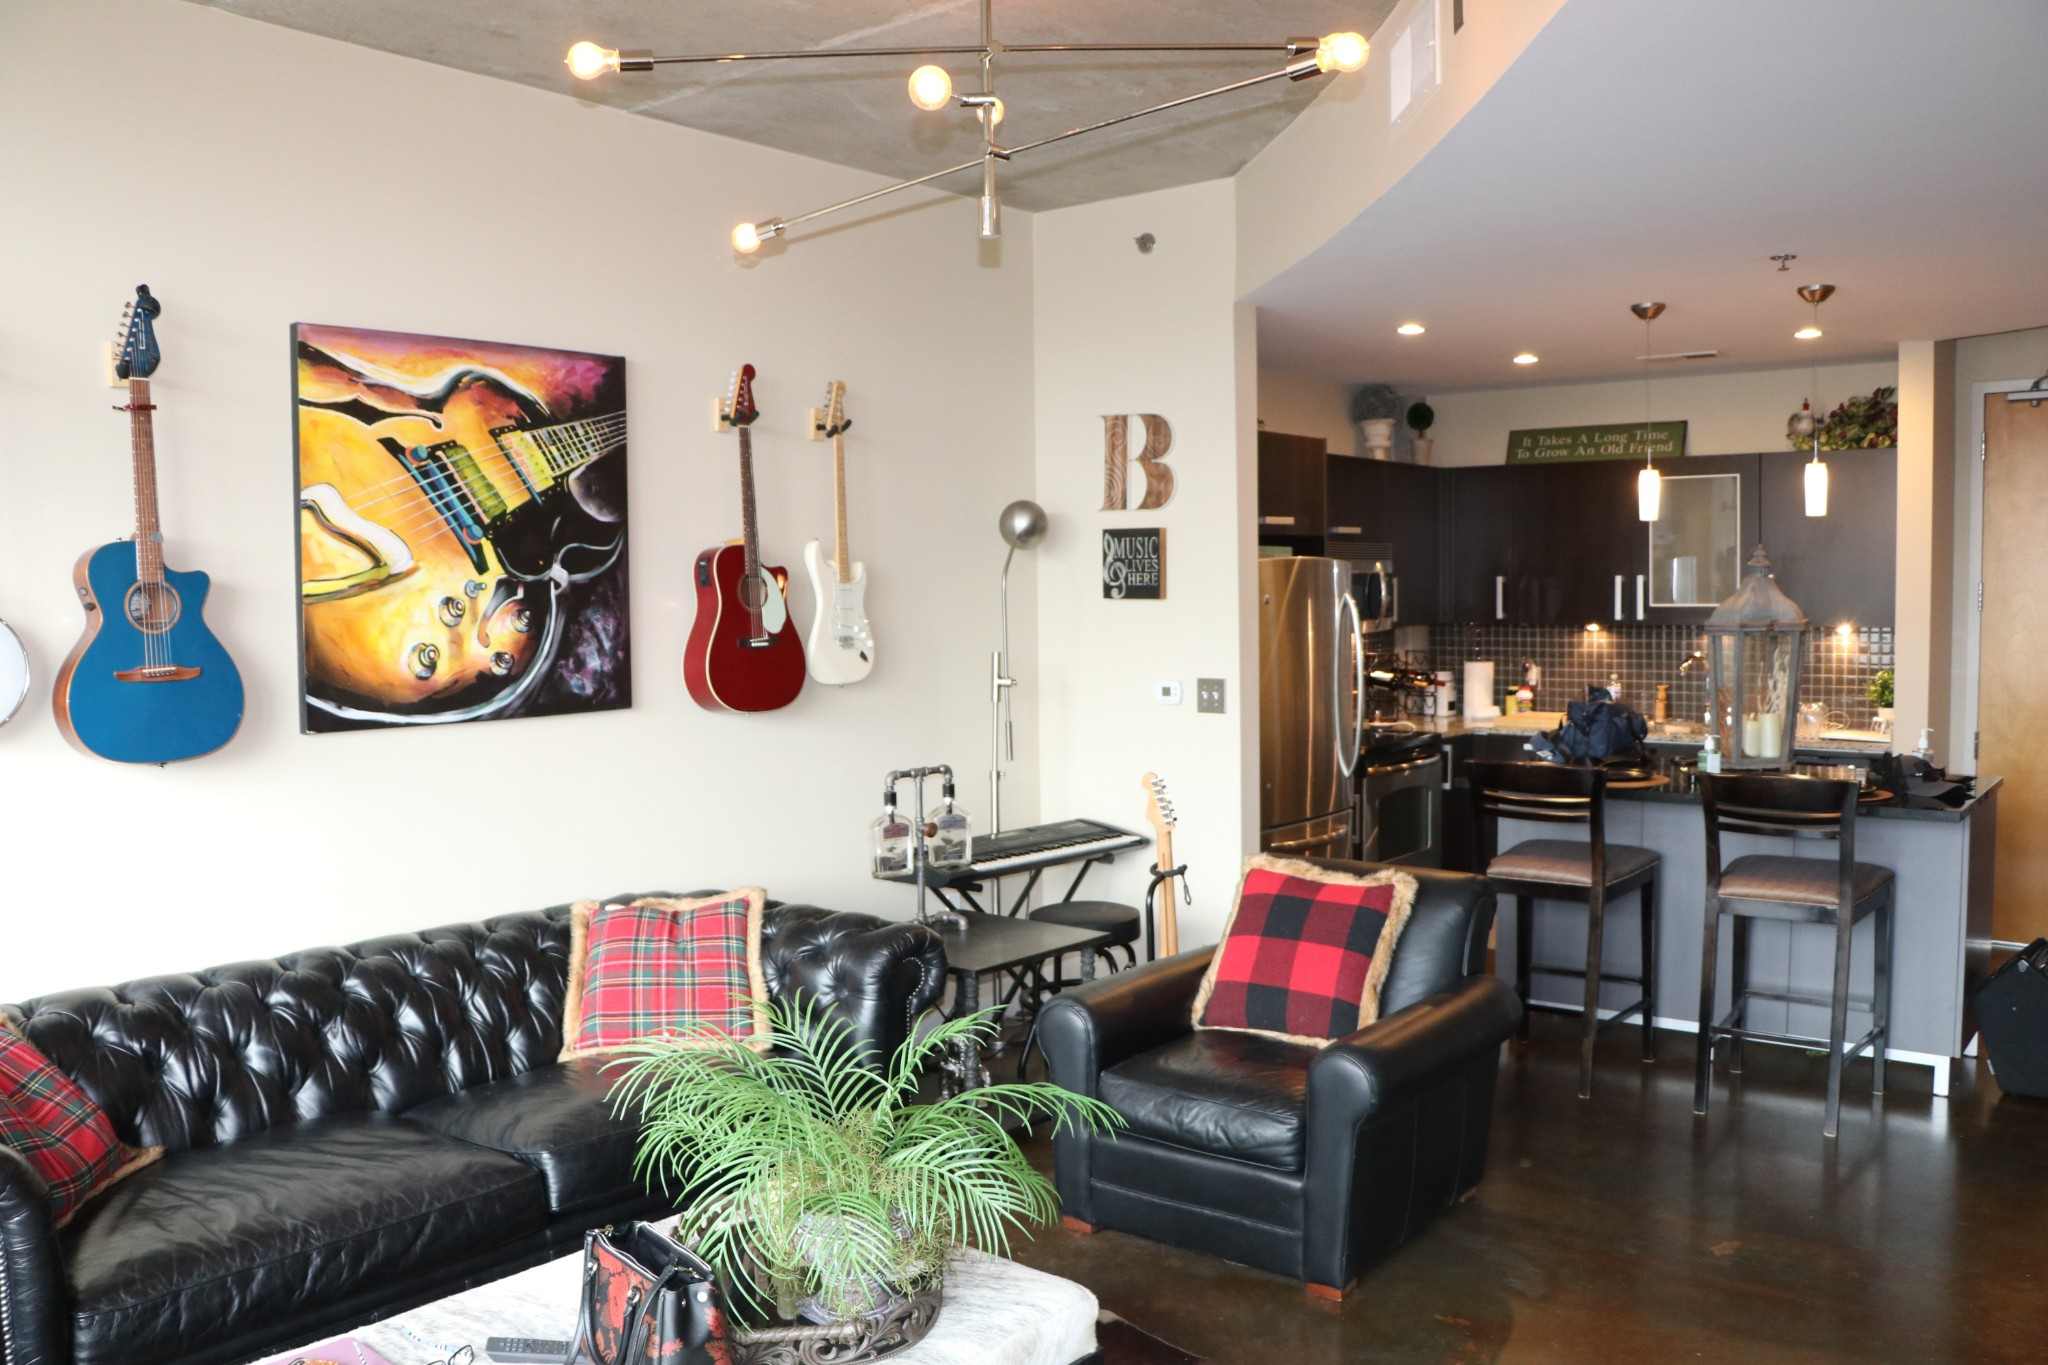 600 12th Ave, S, Nashville, TN 37203 - Nashville, TN real estate listing